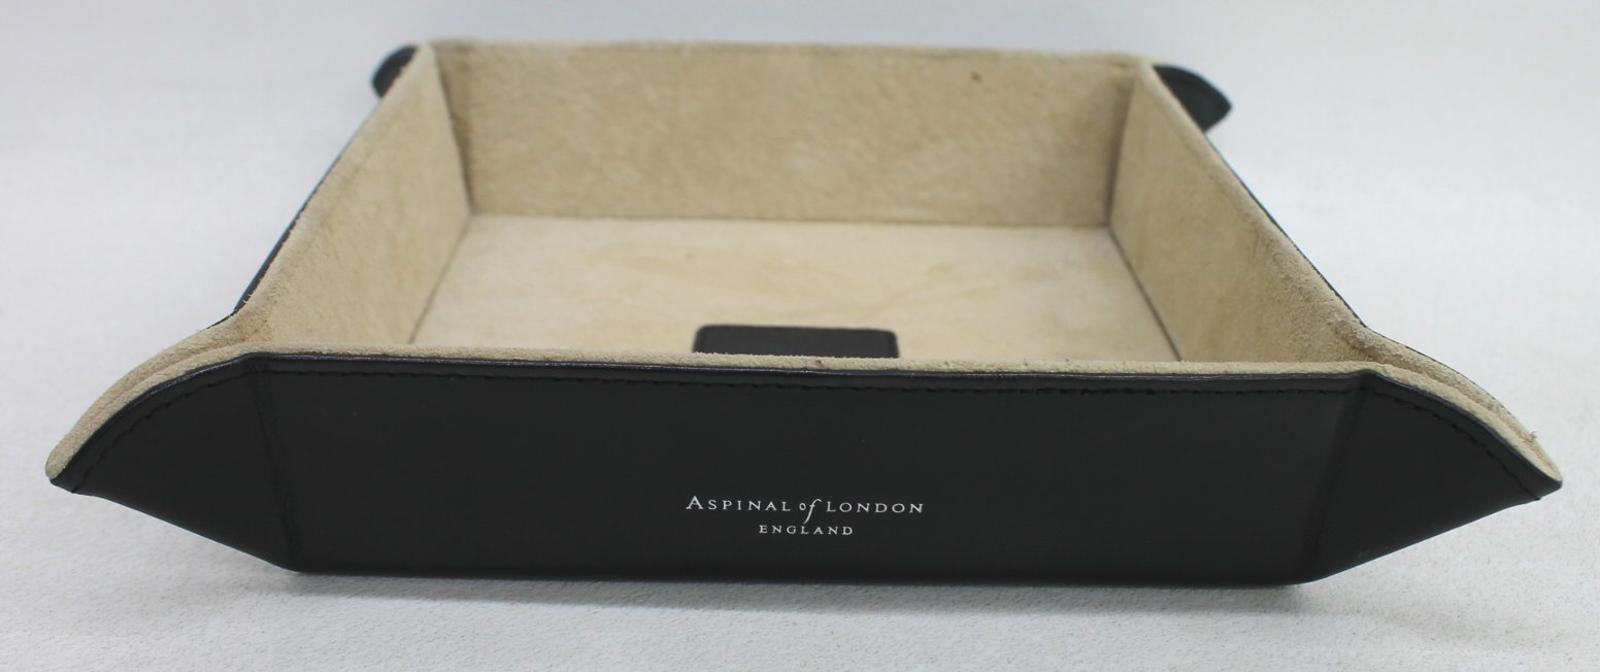 ASPINAL-OF-LONDON-Medium-Tidy-Tray-Smooth-Black-Leather-Trinket-Holder-NEW